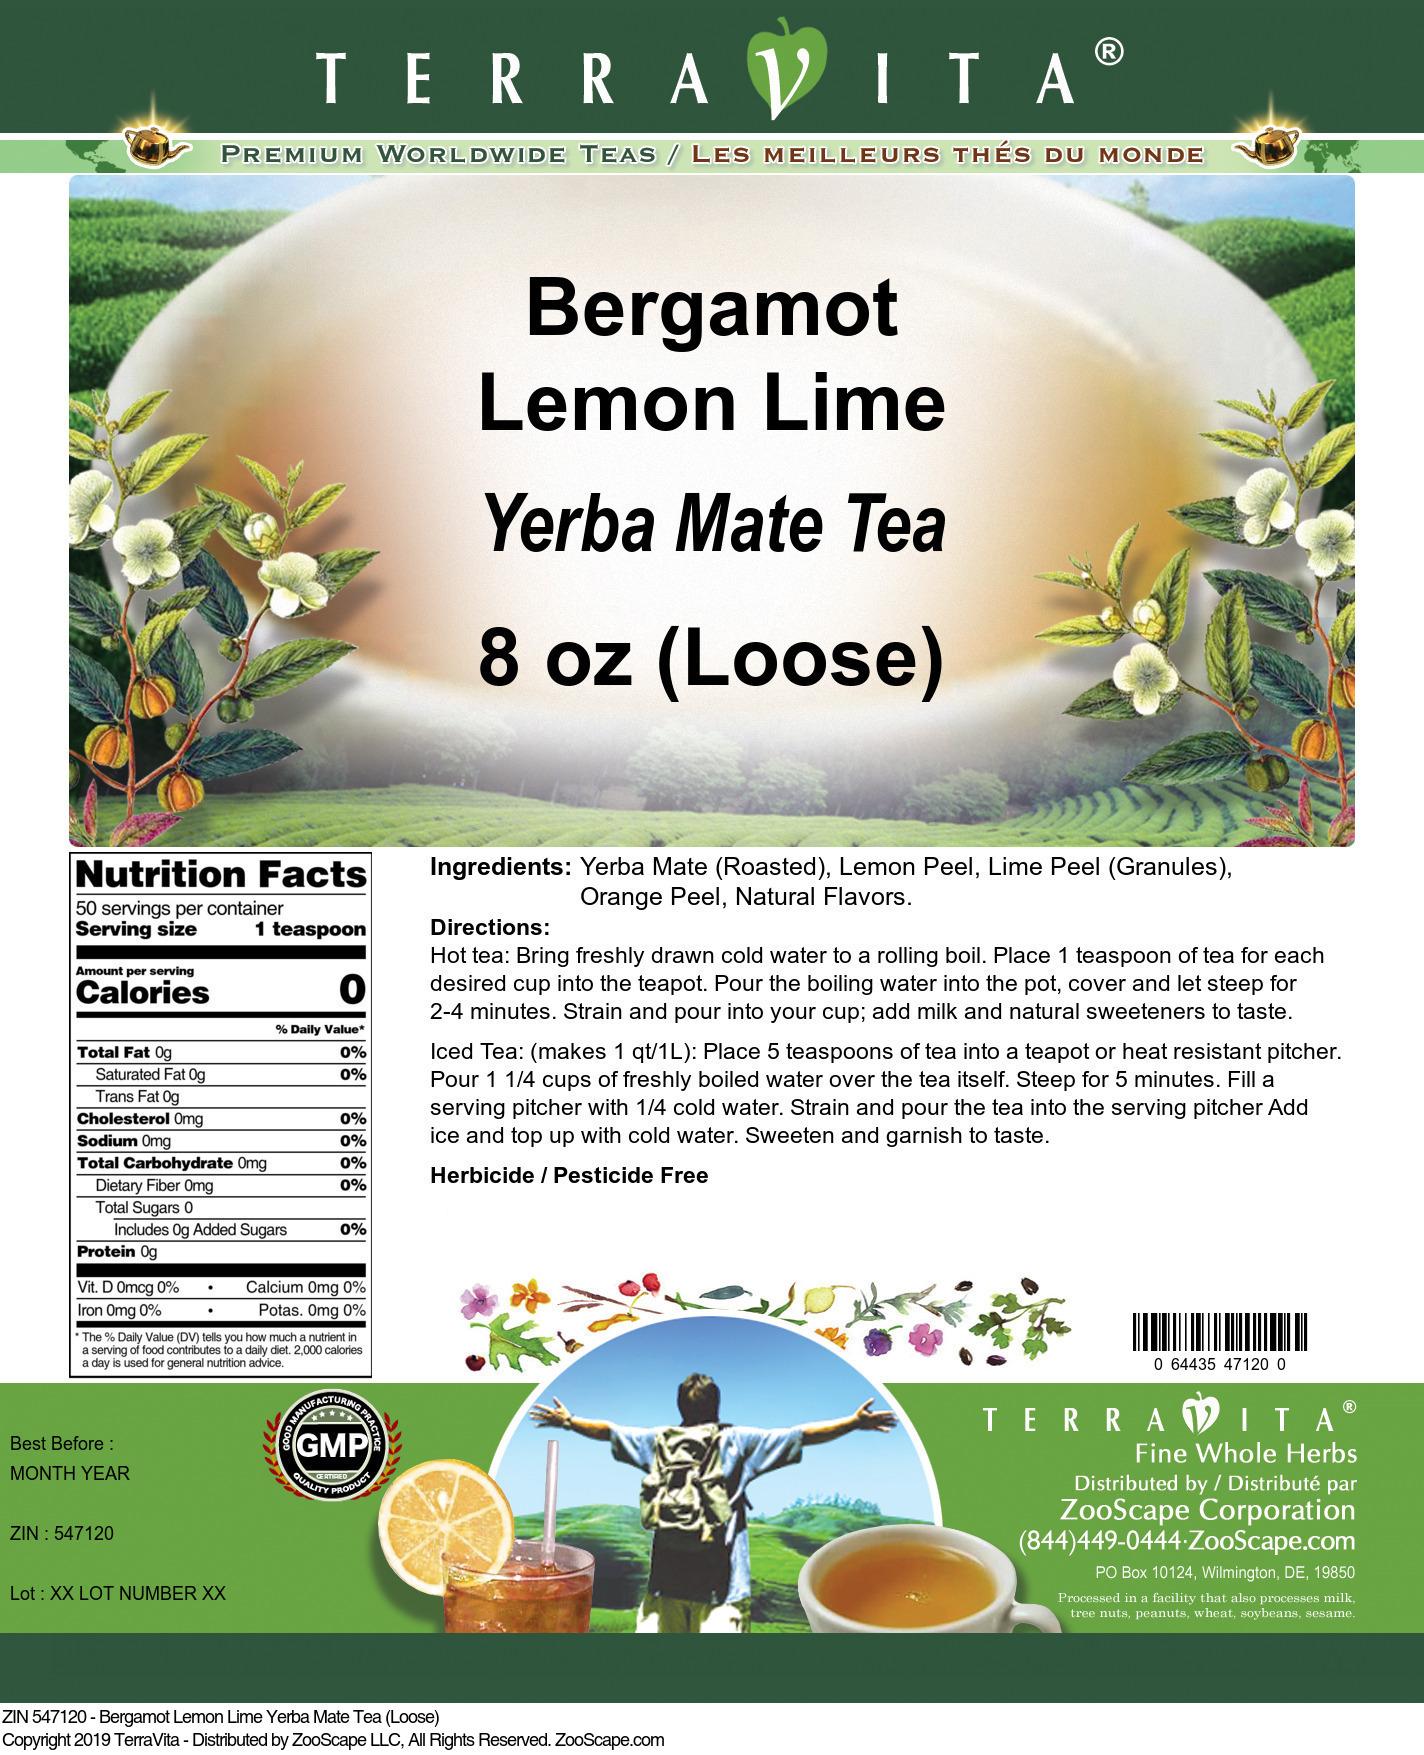 Bergamot Lemon Lime Yerba Mate Tea (Loose)